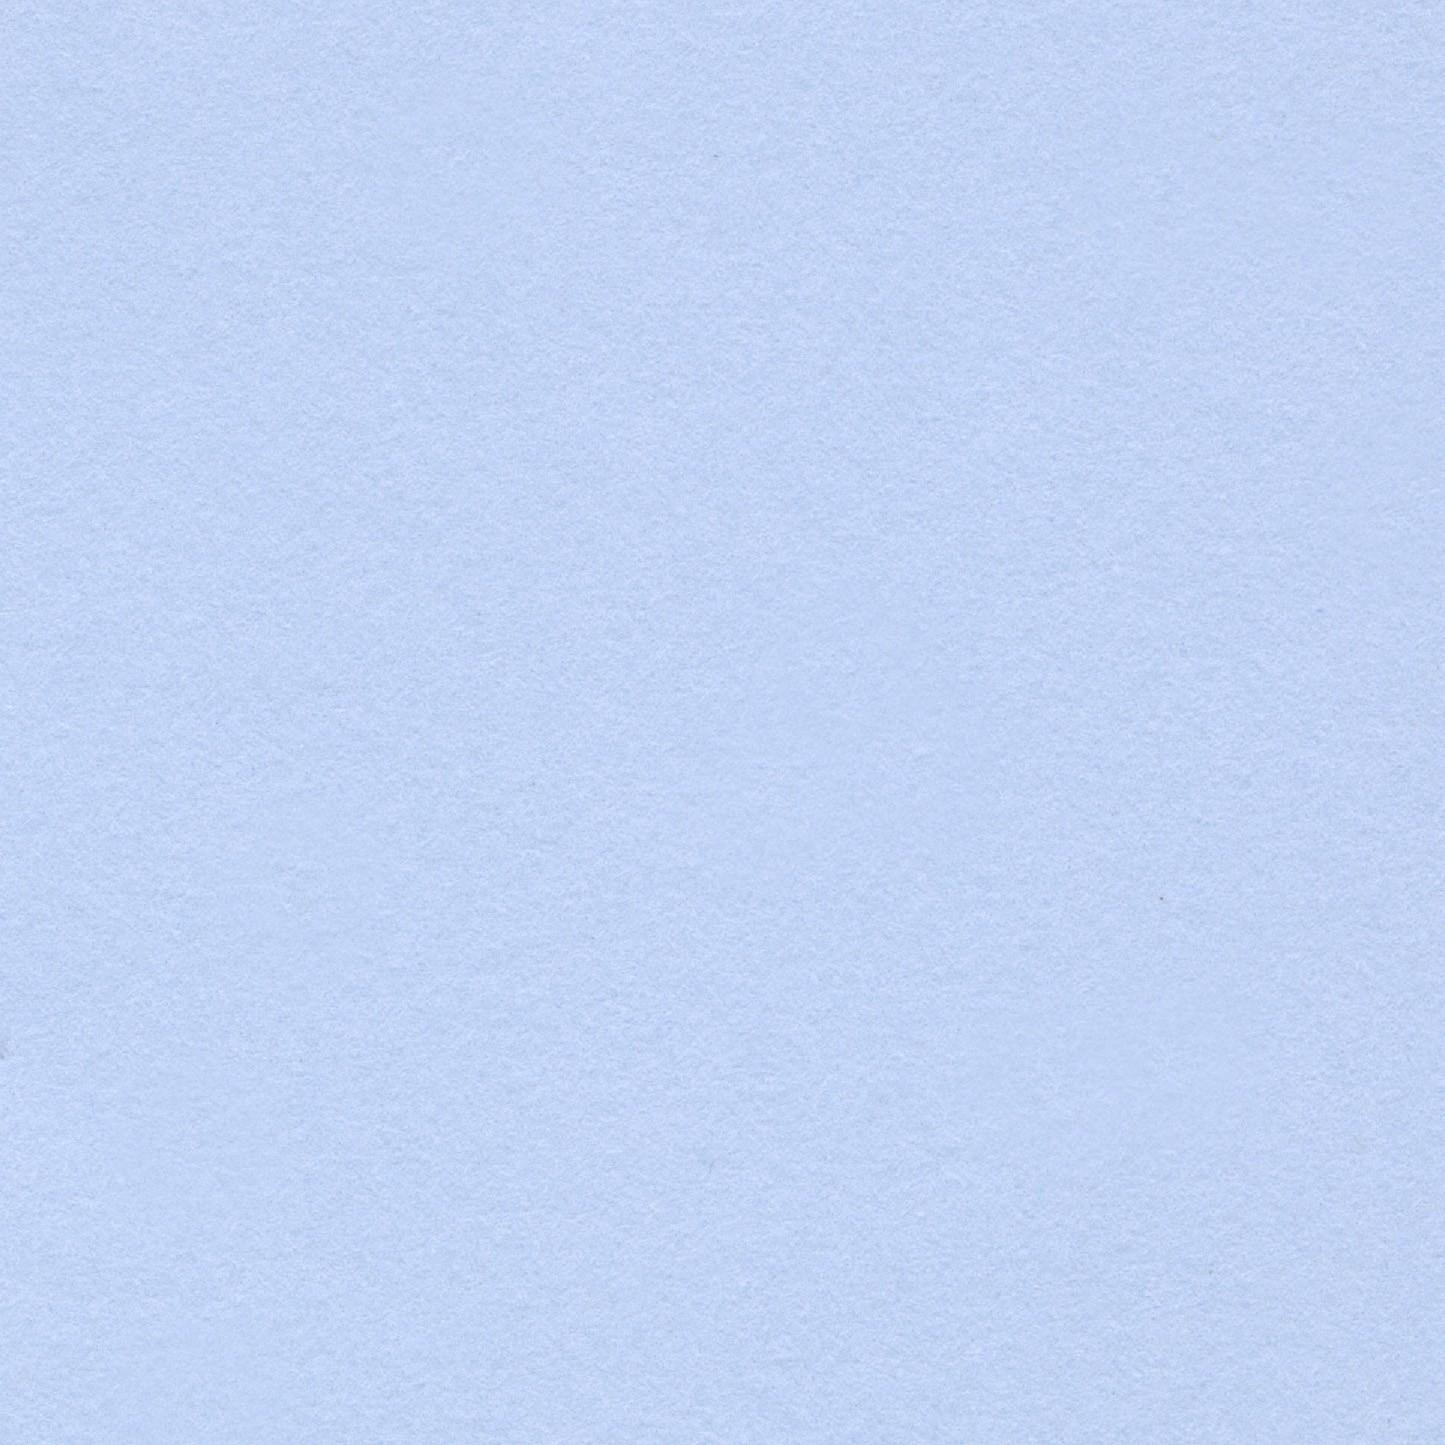 Blue - Light 135gsm